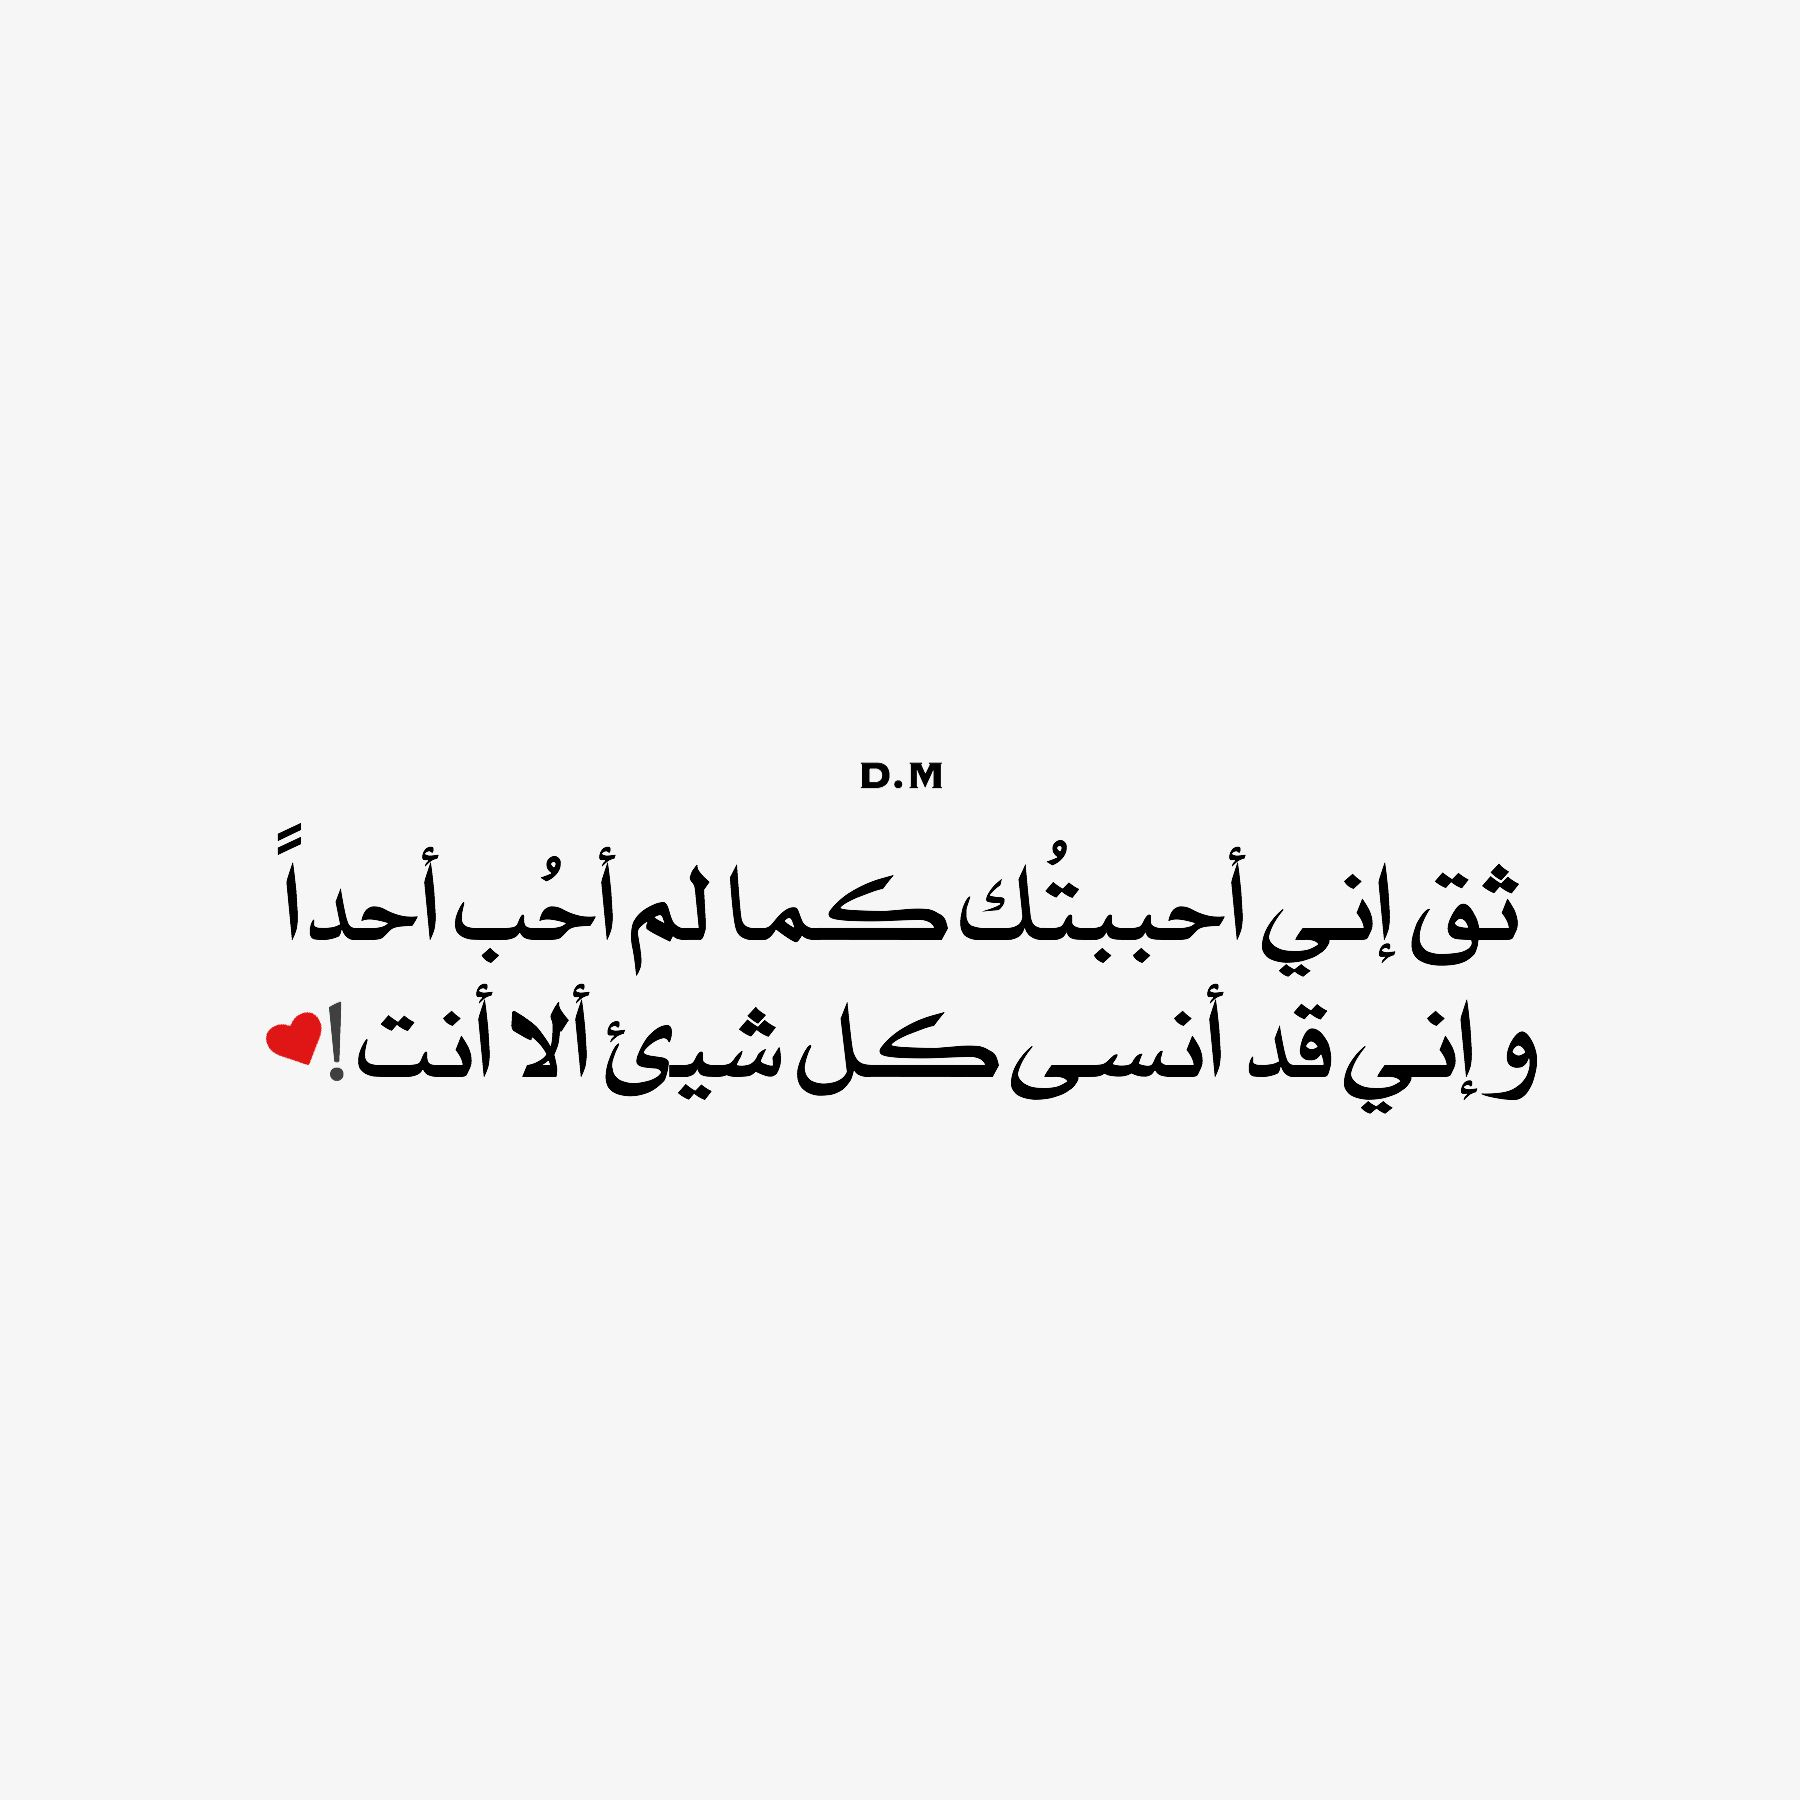 بالصور رسائل حب ورومنسيه , كلمات رومانسيه بين الاحبه unnamed file 248